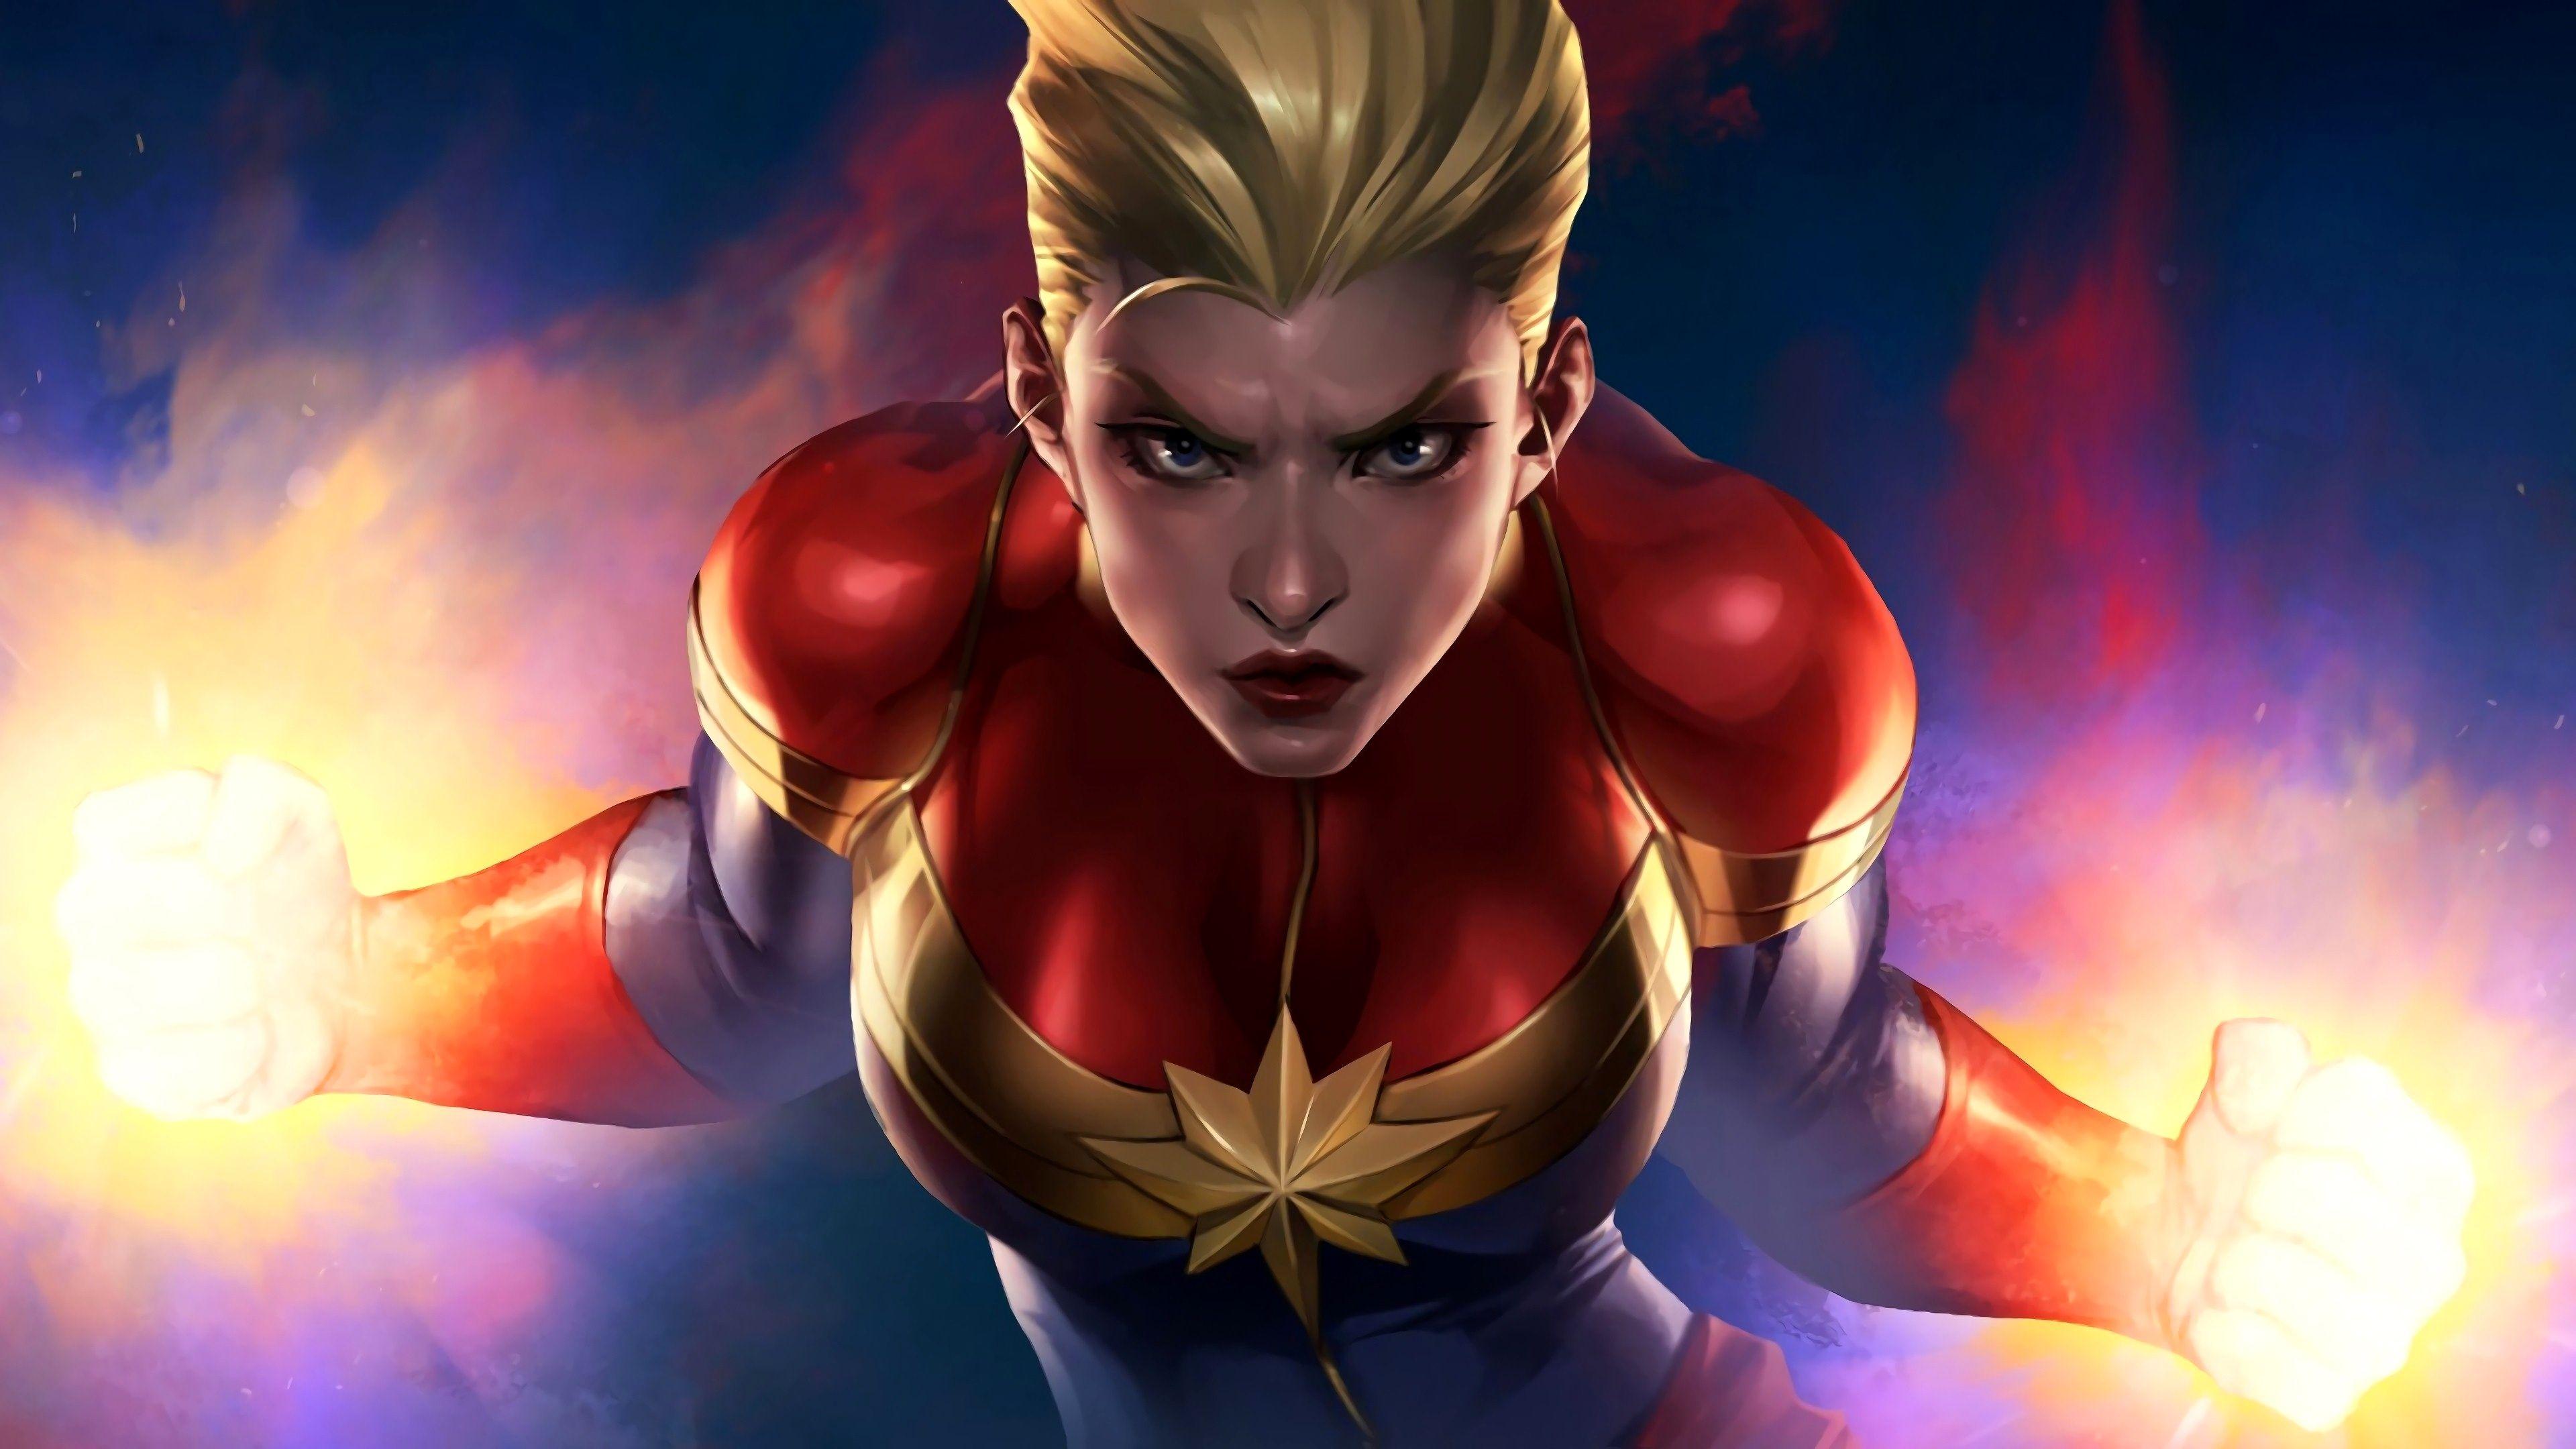 Captain Marvel Wallpaper 4k Mobile Gallery Hadari